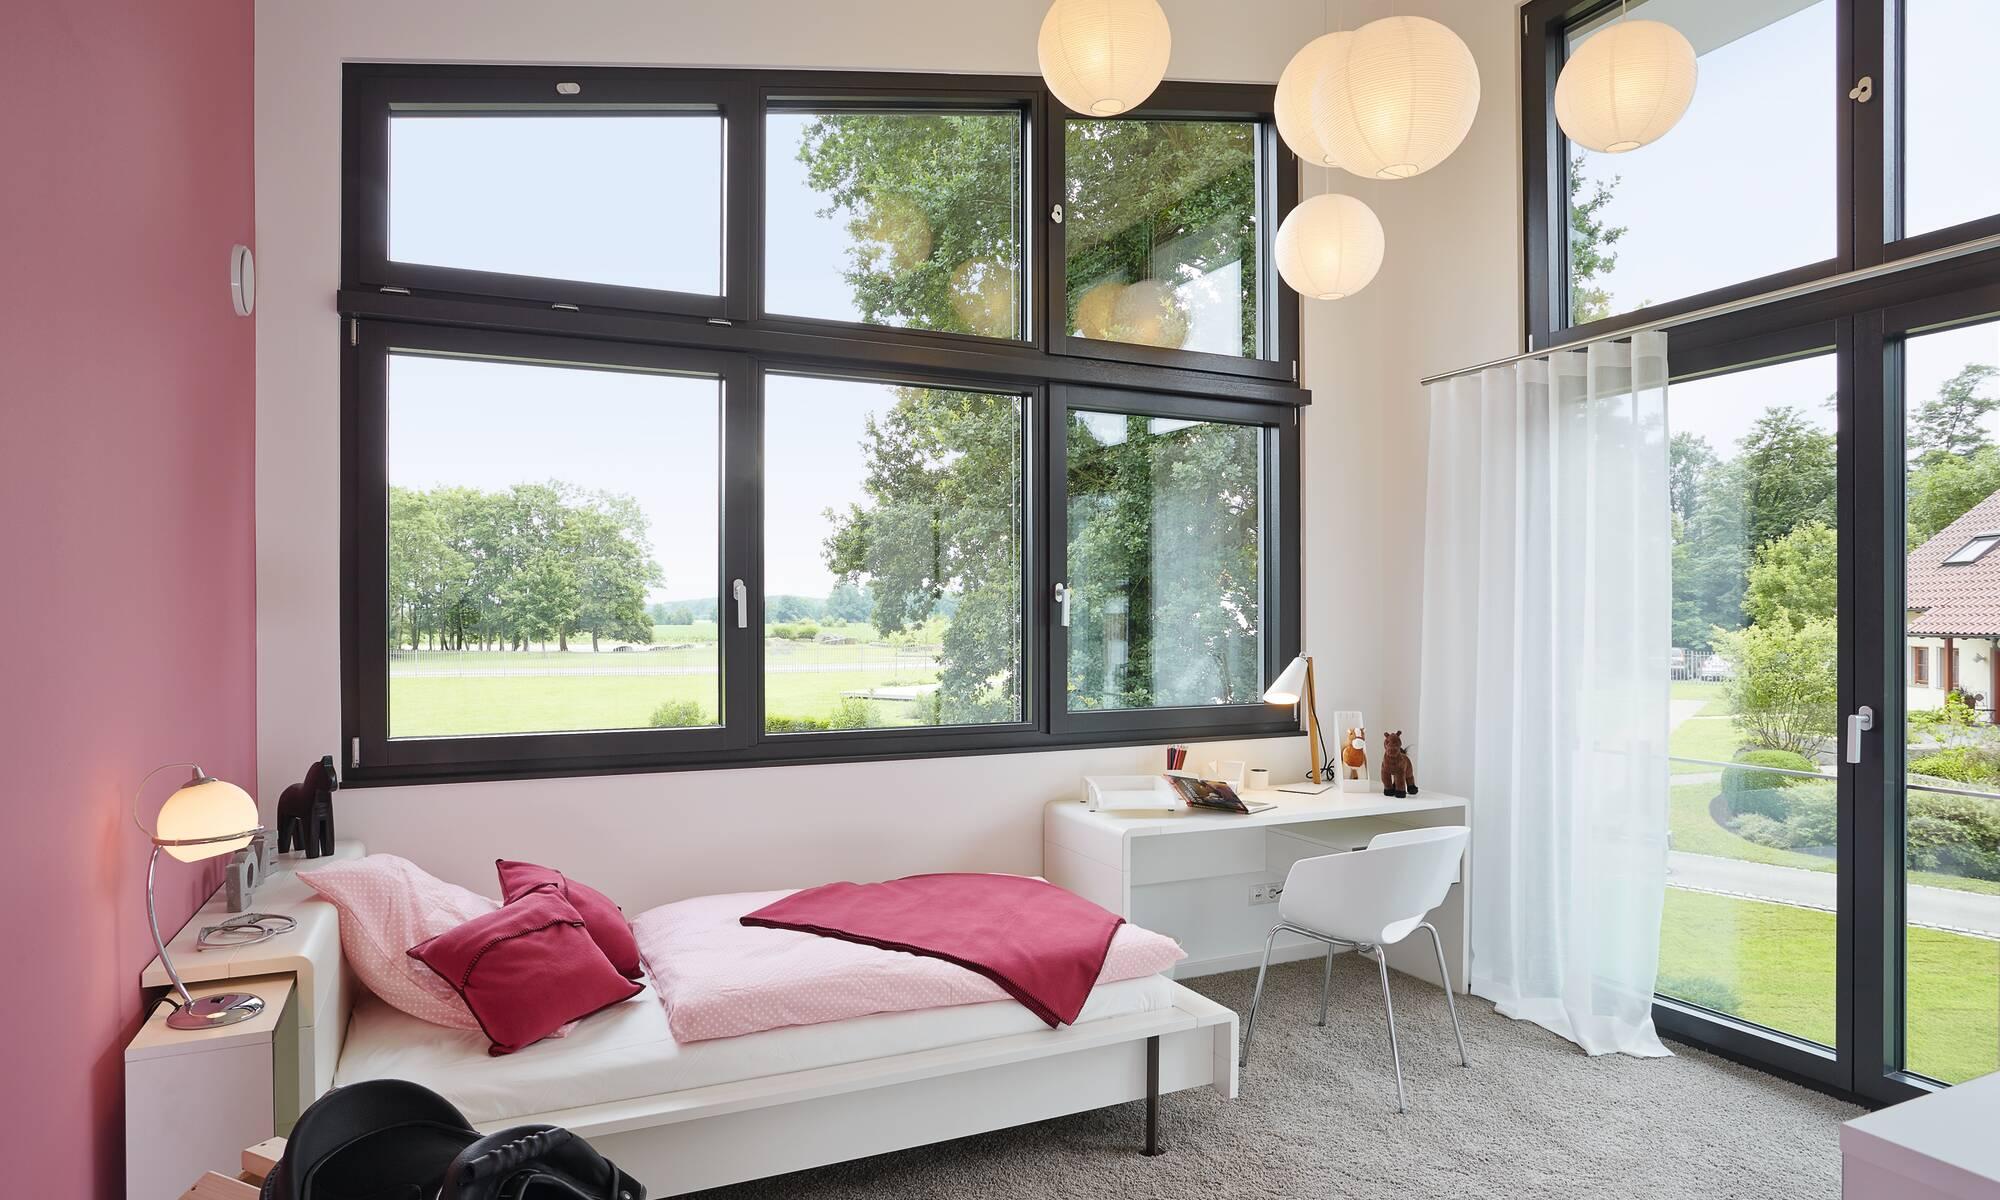 Contemporary urban loft style self-build home